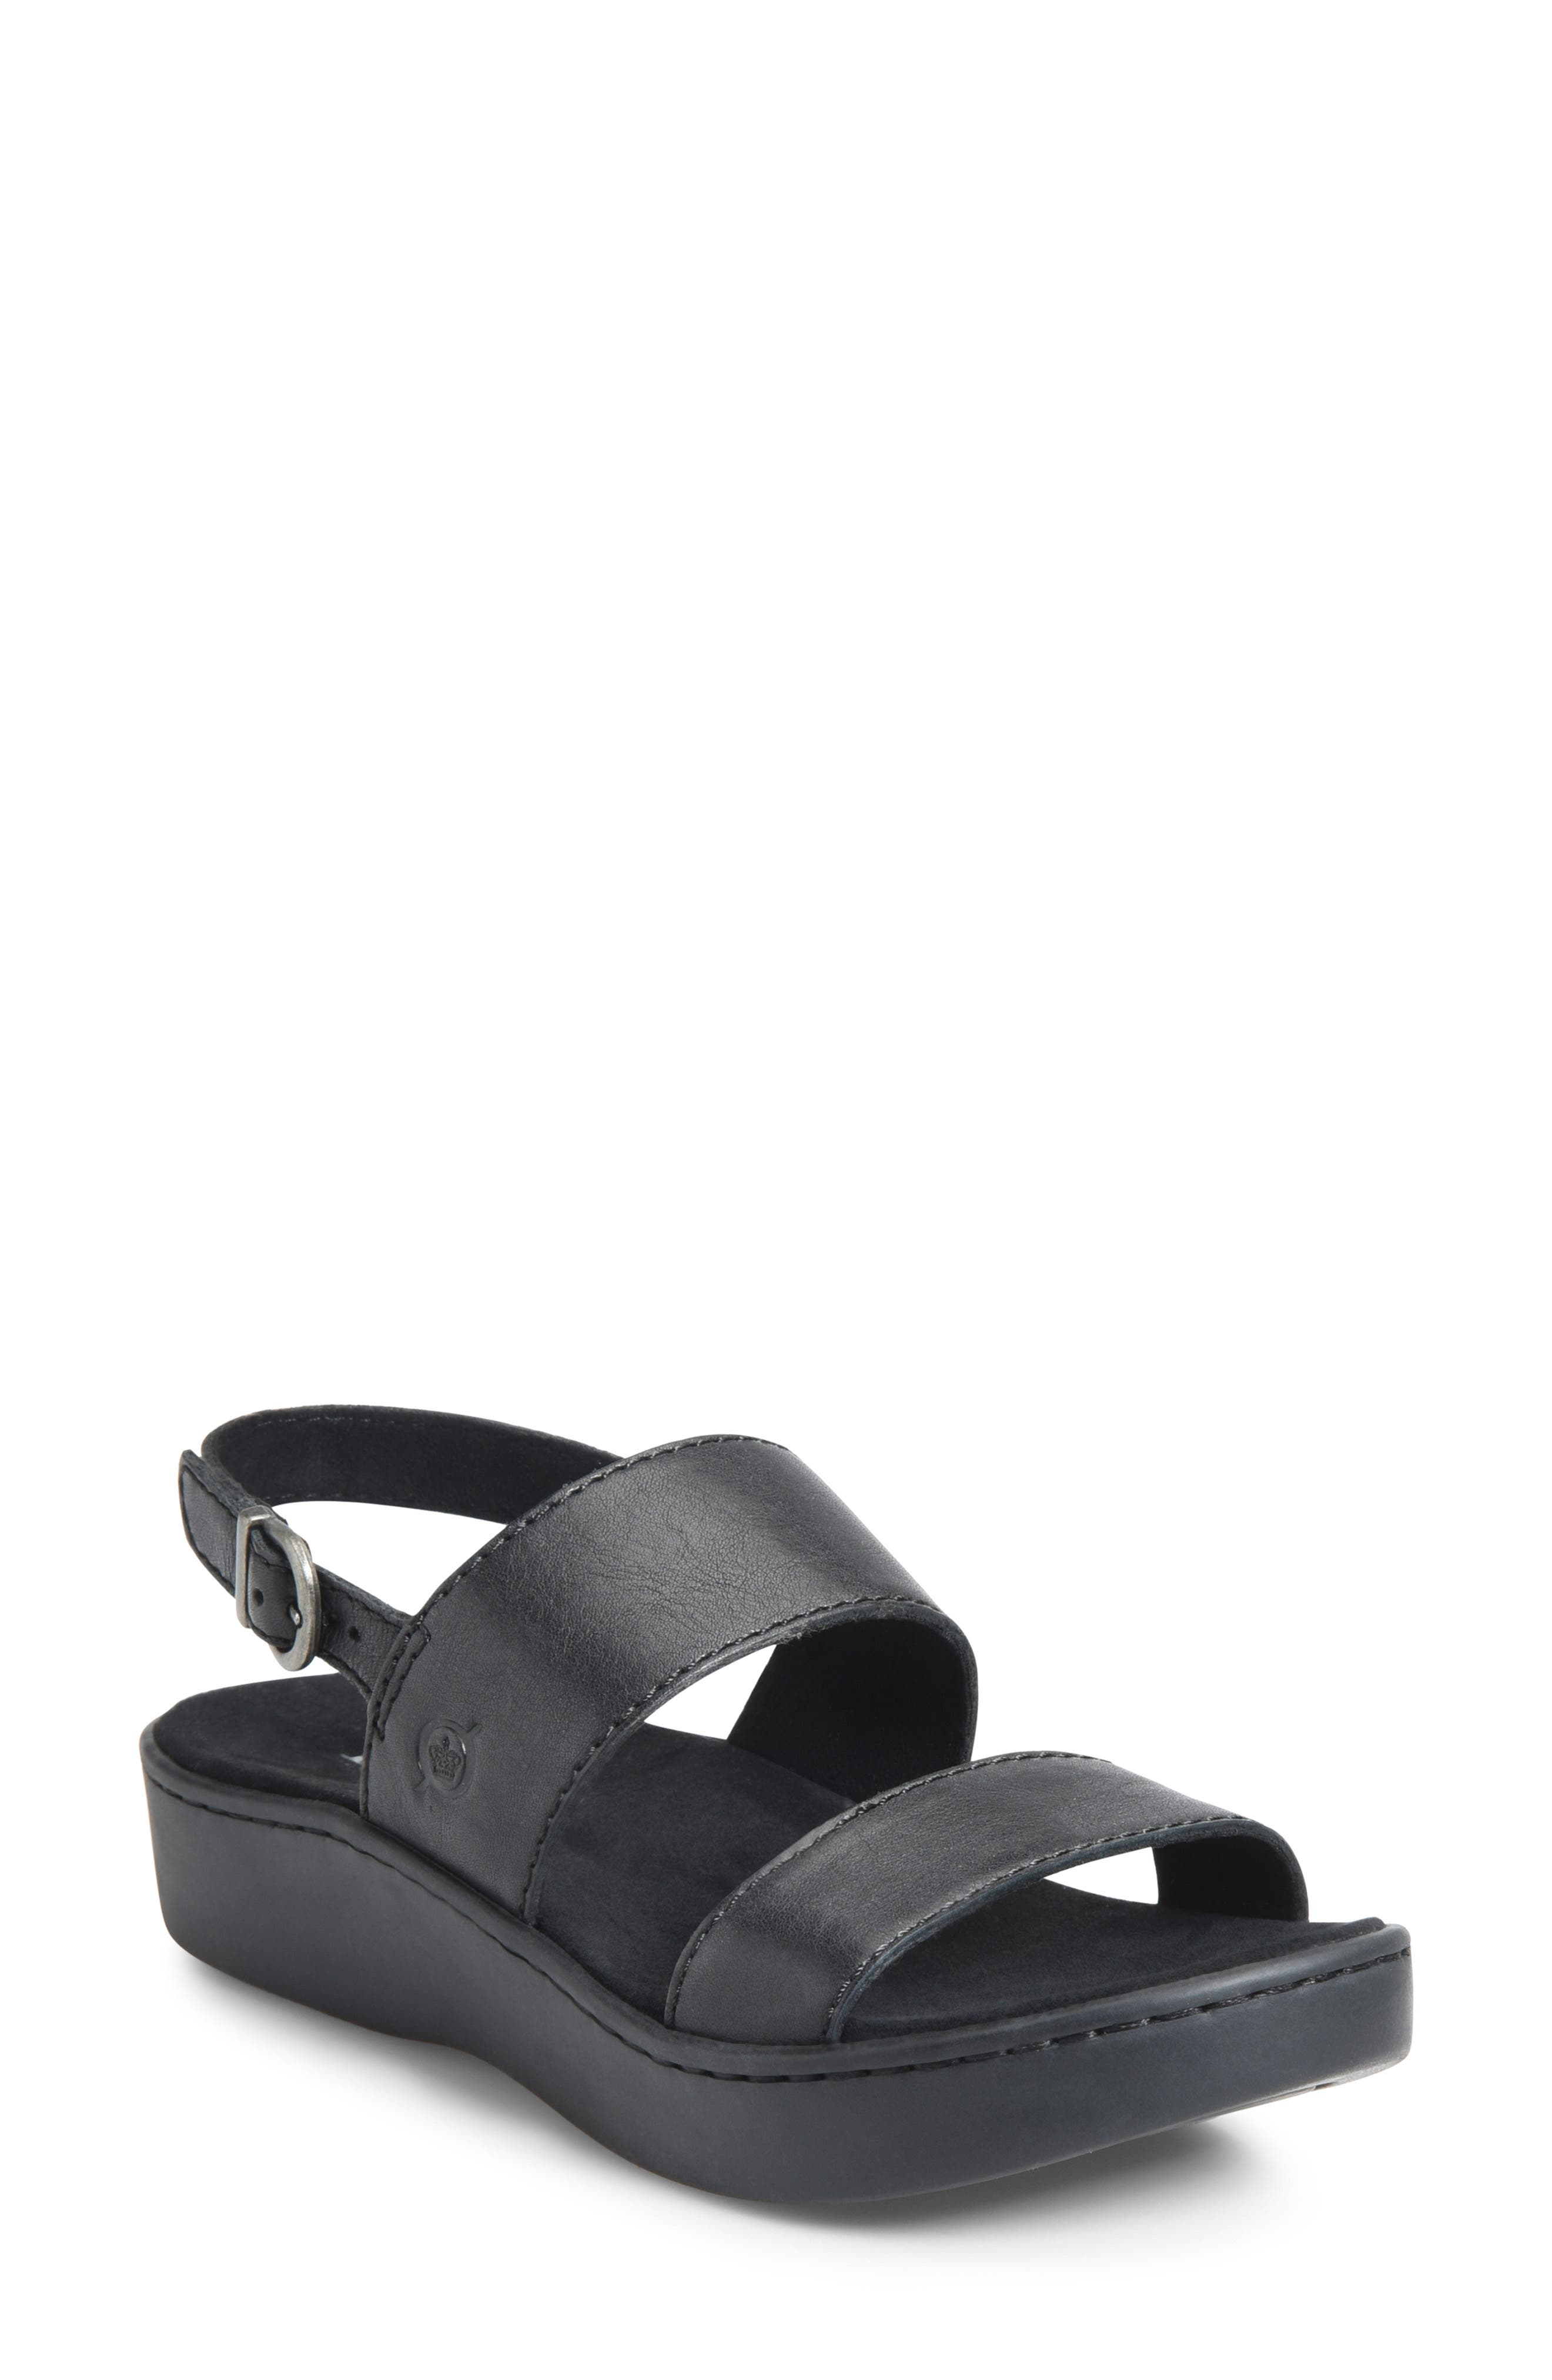 B?rn Oconee Platform Sandal, Black